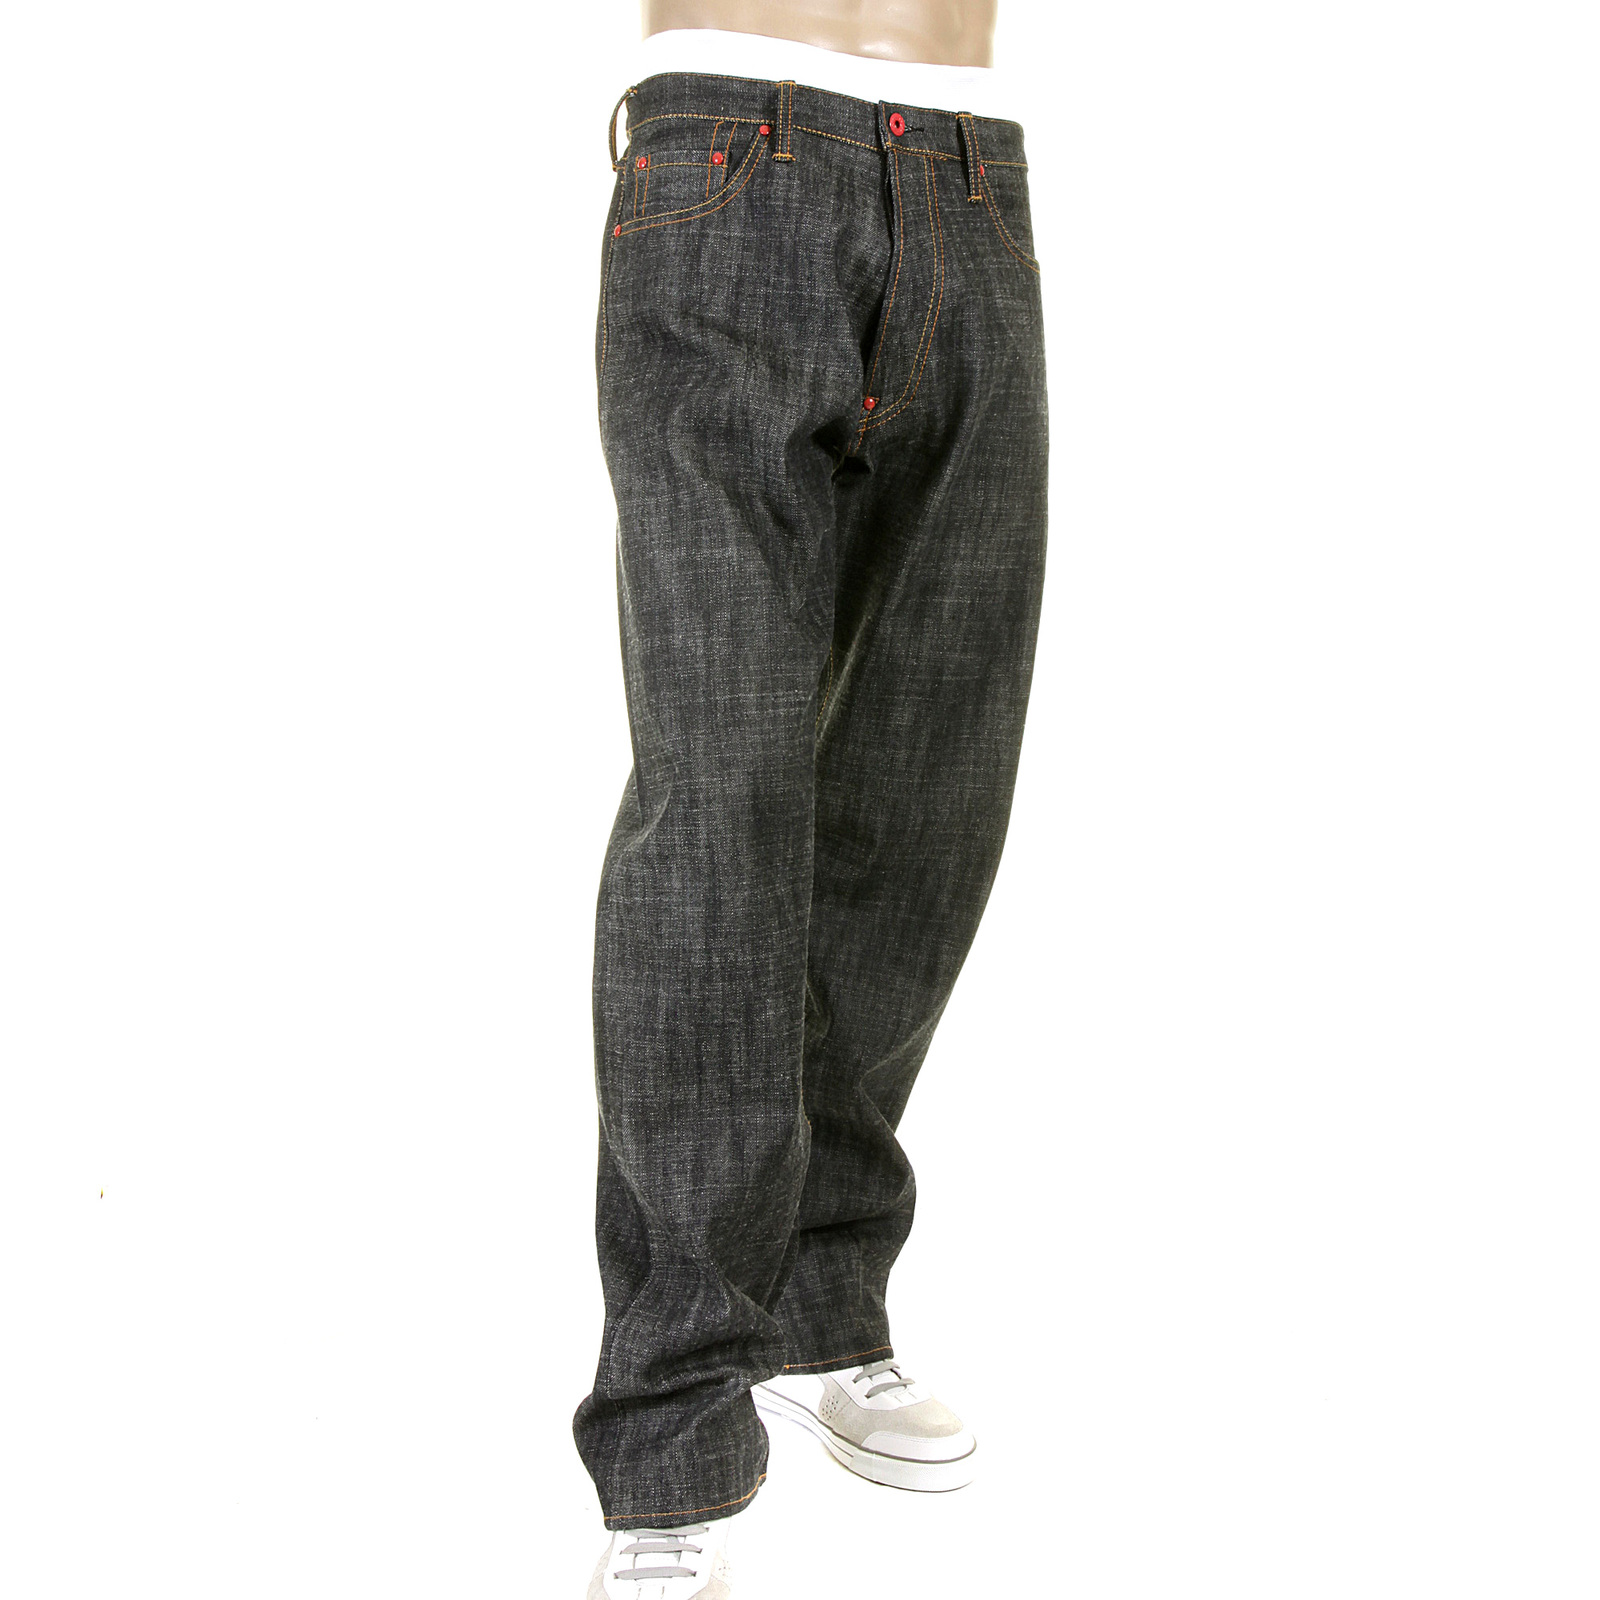 Red Monkey Vintage Fit Black Raw Selvedge Denim Jeans